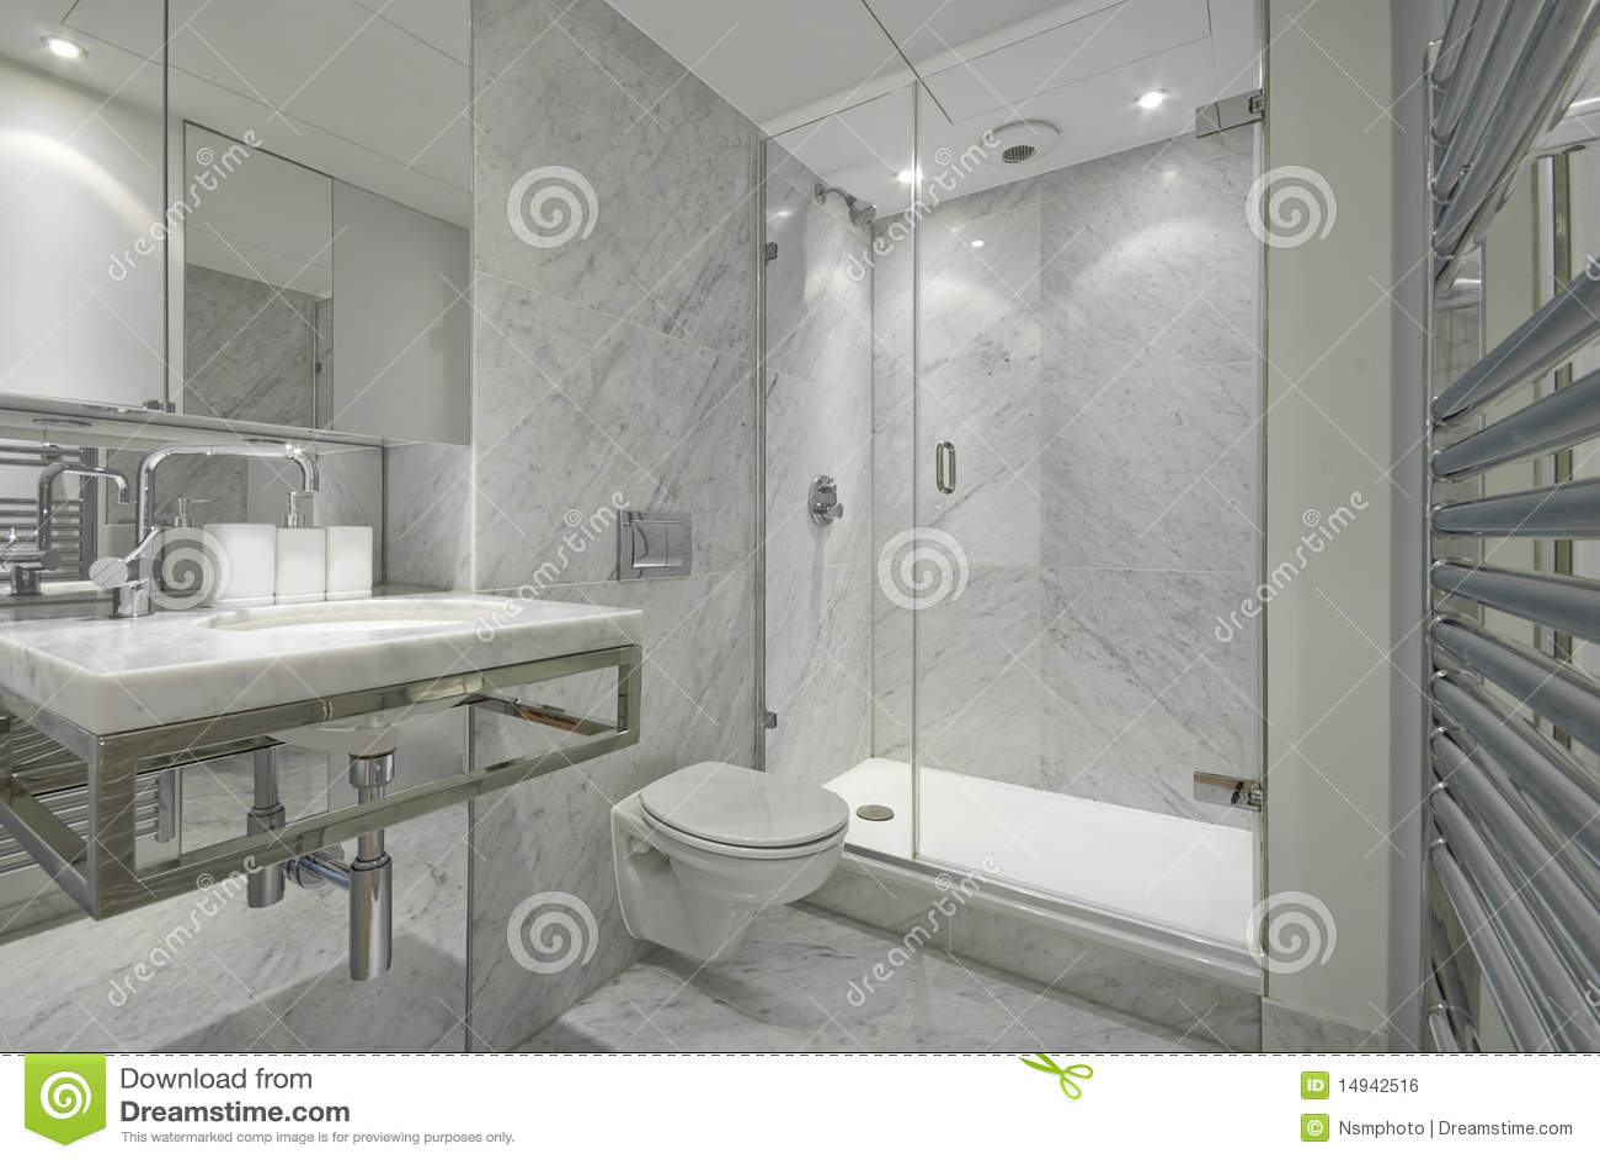 Baños Modernos Marmol:Modern White Marble Bathroom